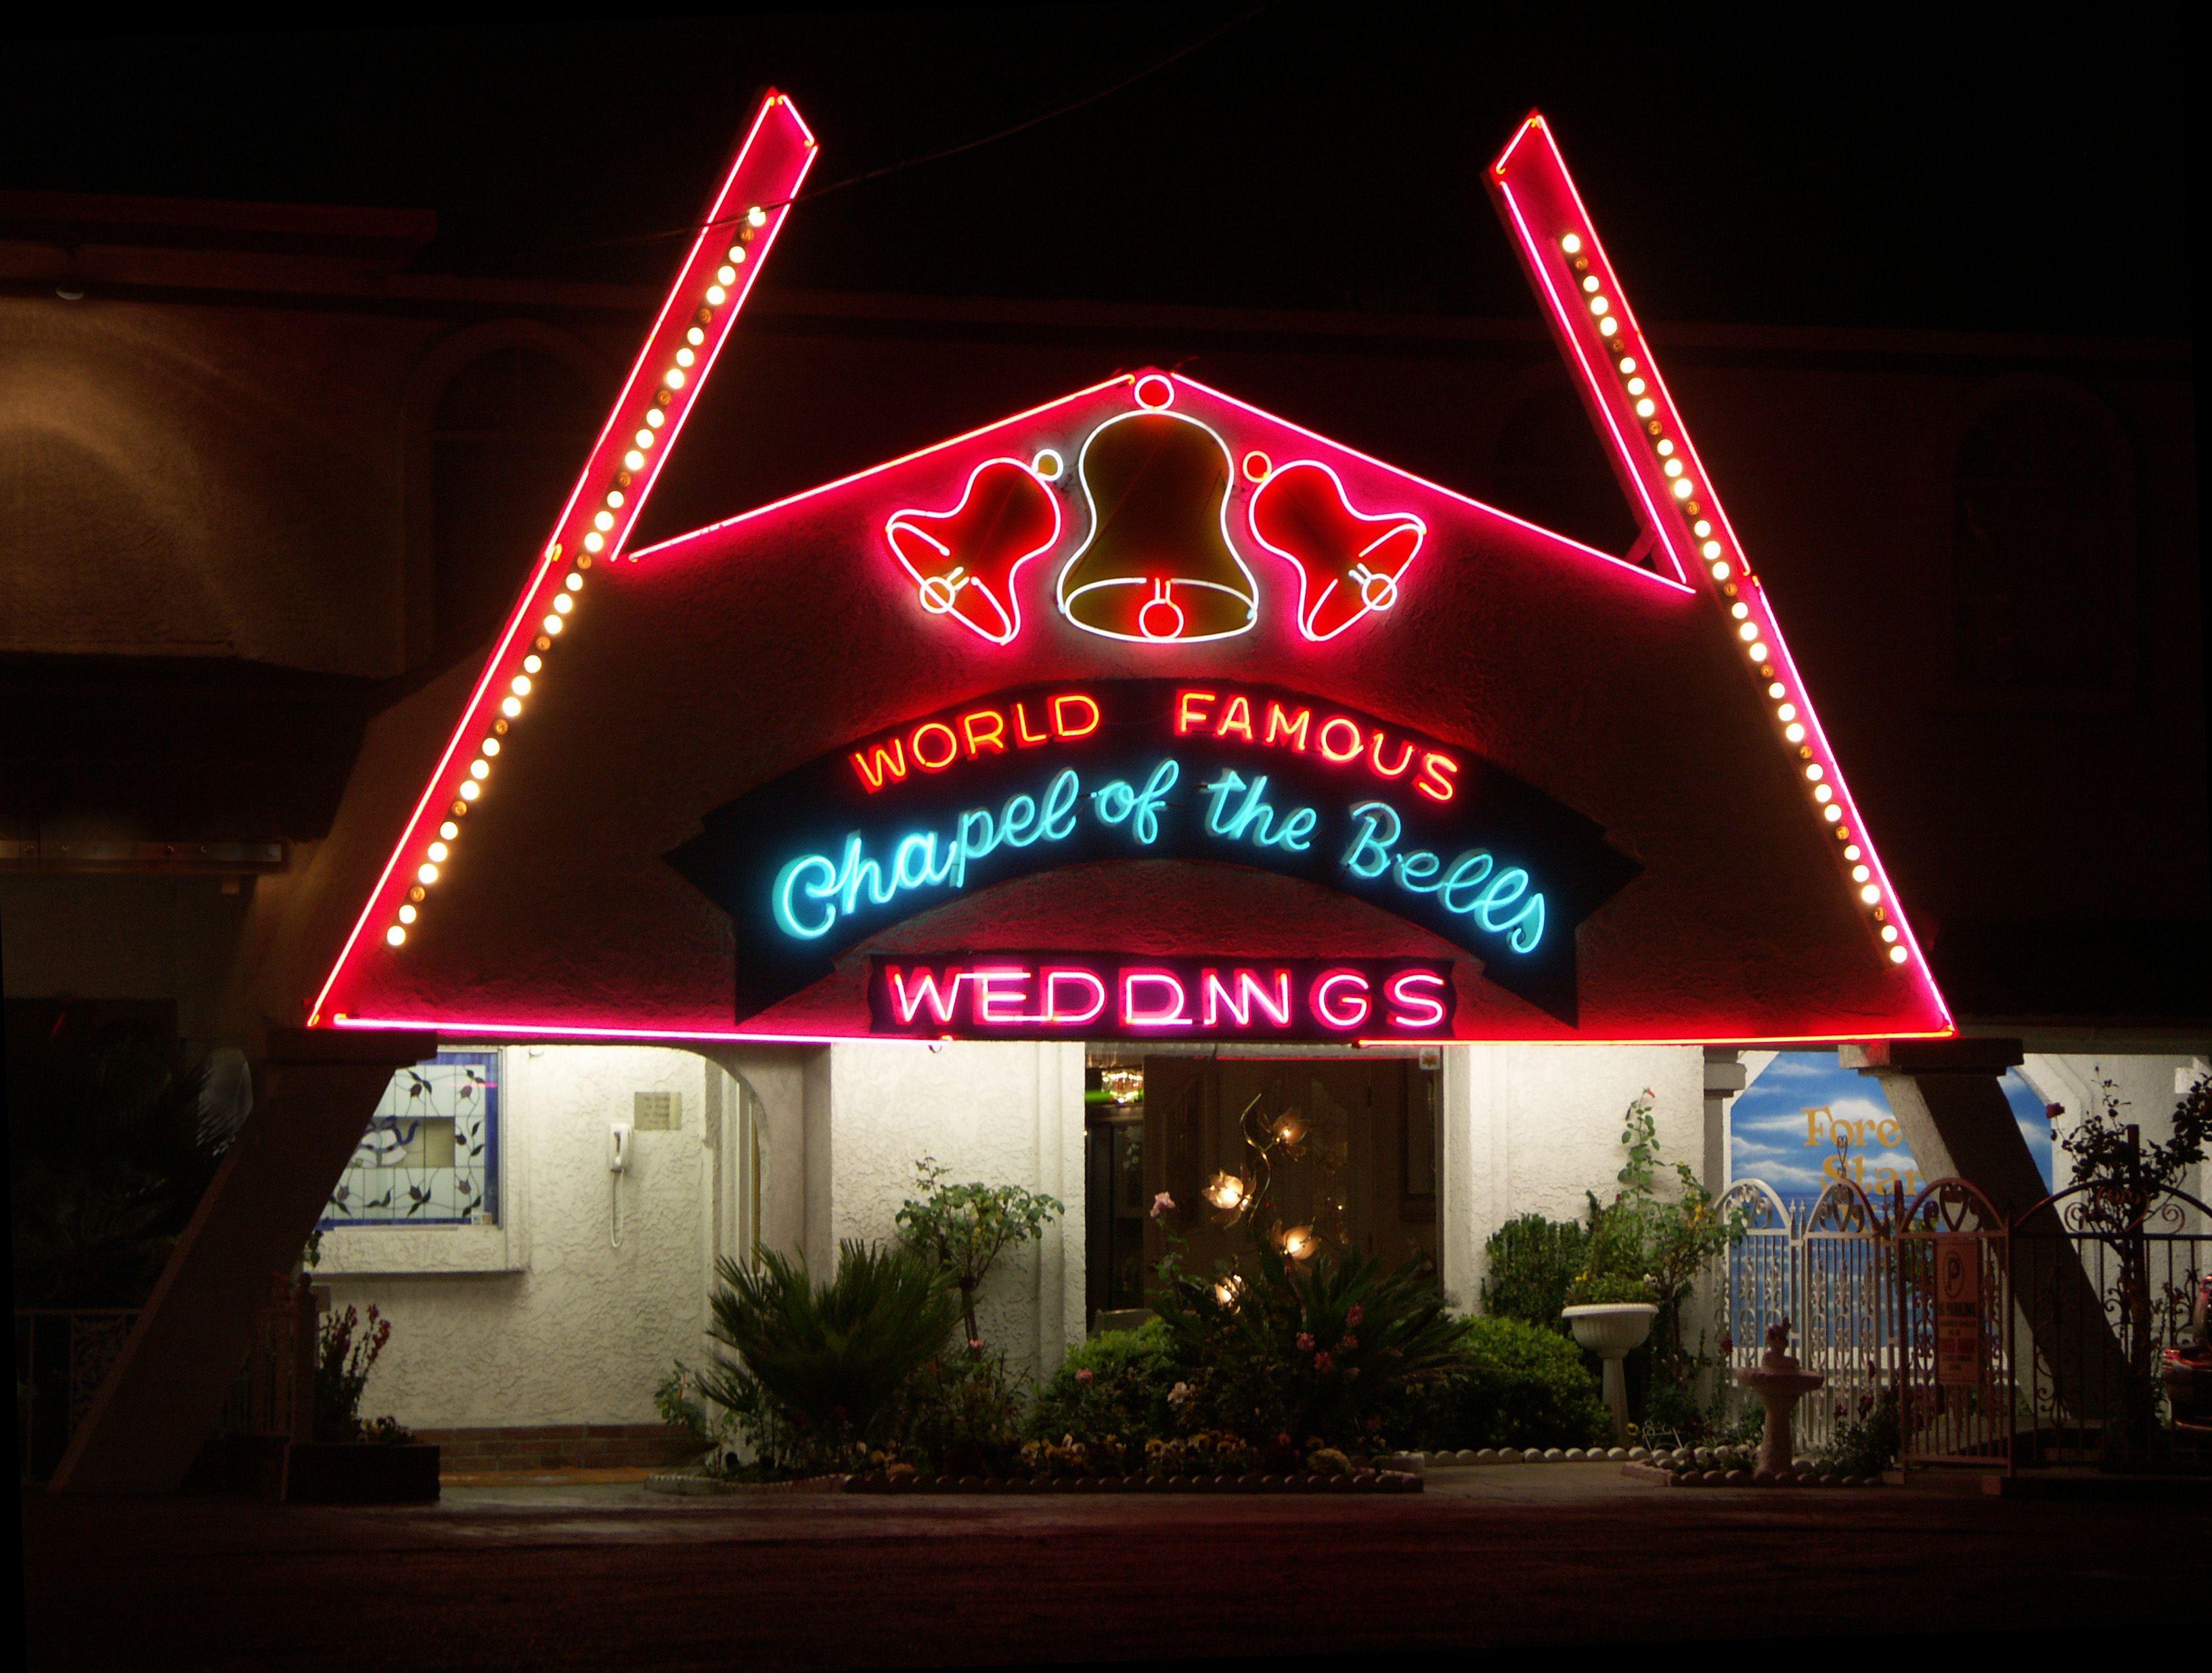 I Have Driven By This Landmark Many Many Times Vegas Wedding Chapel Las Vegas Free Vegas Wedding